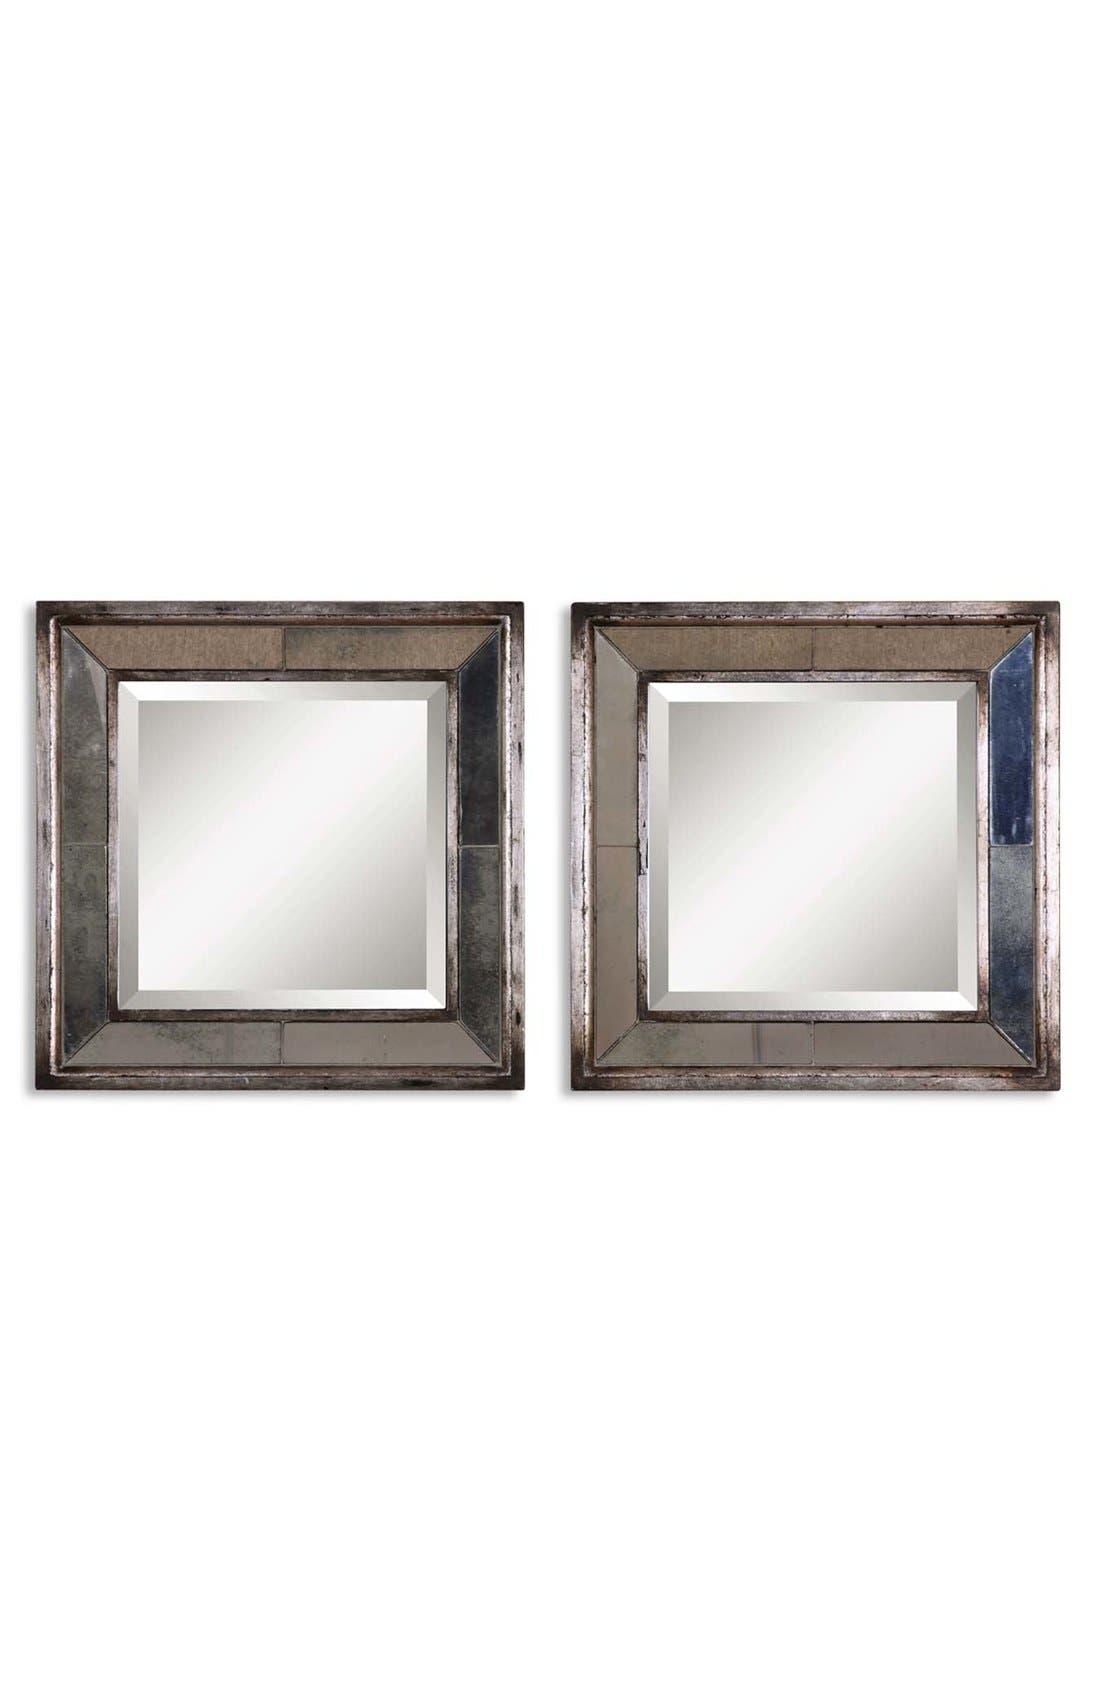 Alternate Image 1 Selected - Uttermost 'Davion' Square Mirror (Set of 2)